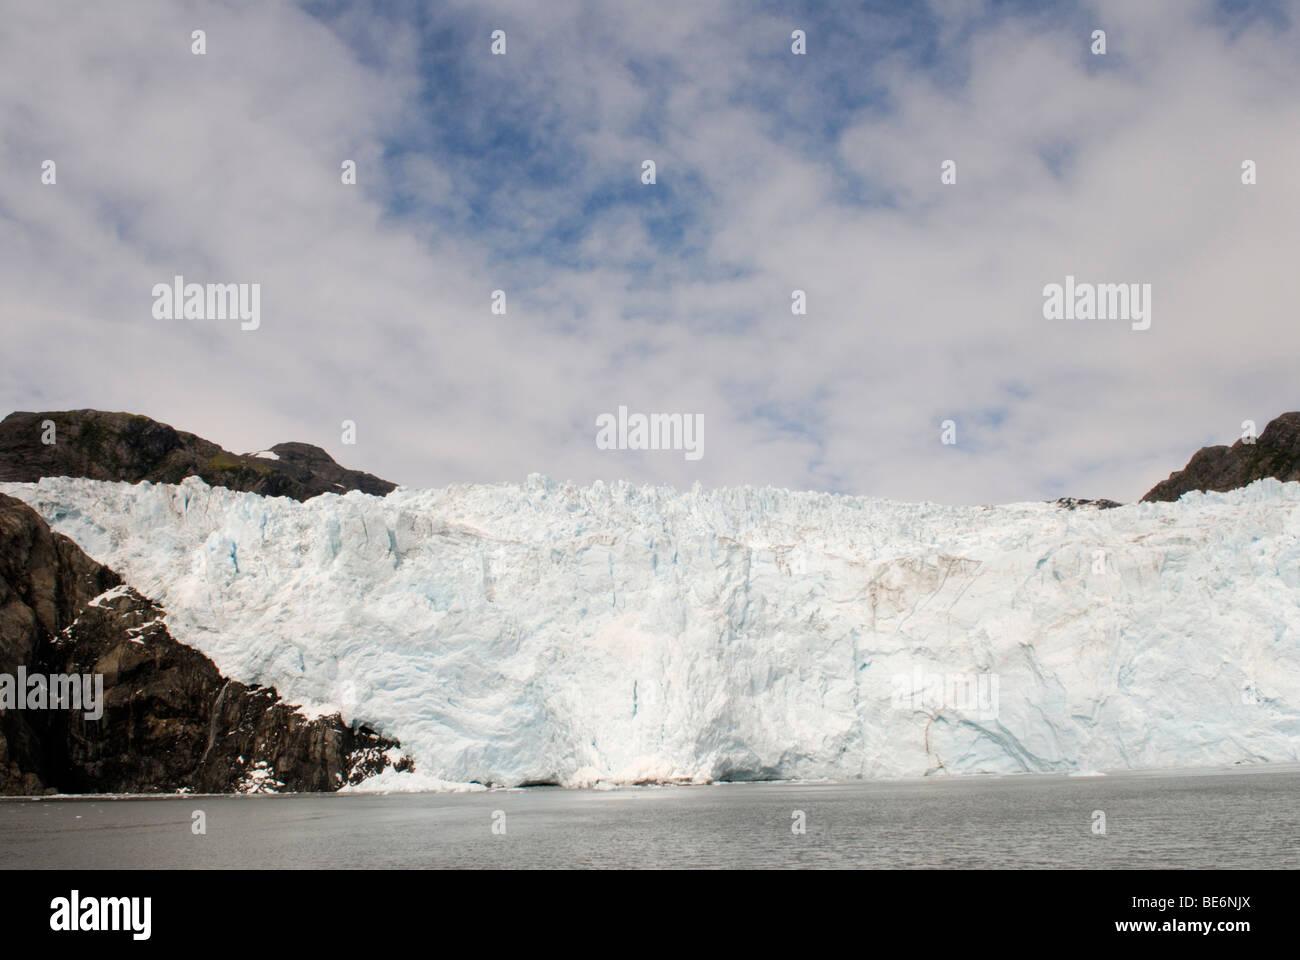 Holgate Glacier, Kenai Fjords National Park - Stock Image